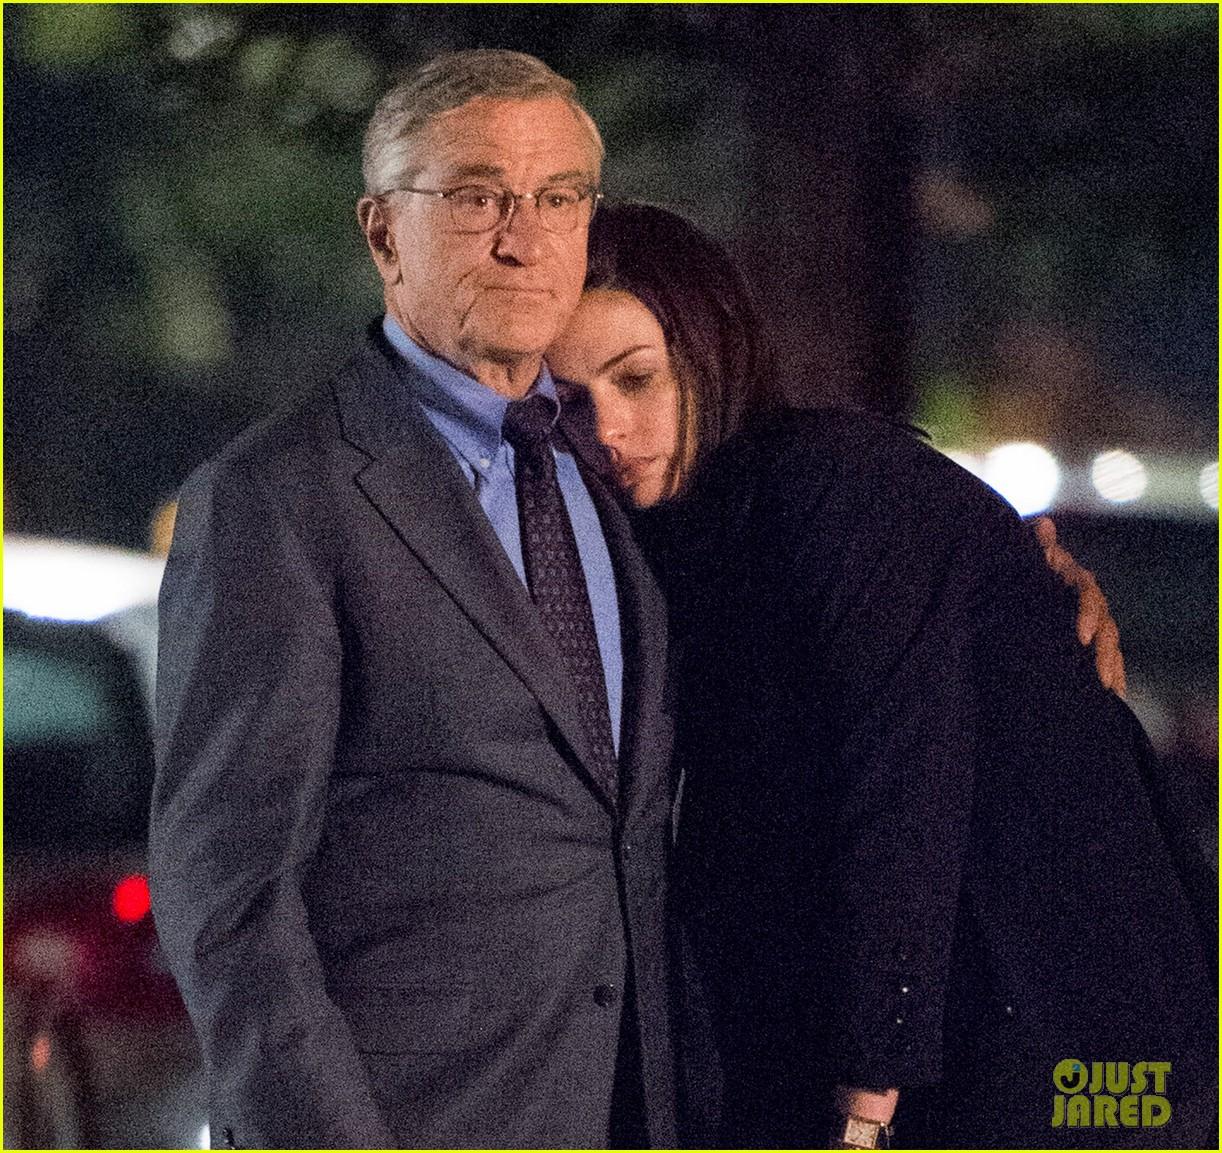 Anne Hathaway And Robert De Niro: Robert De Niro Holds Back Anne Hathaway's Hair While